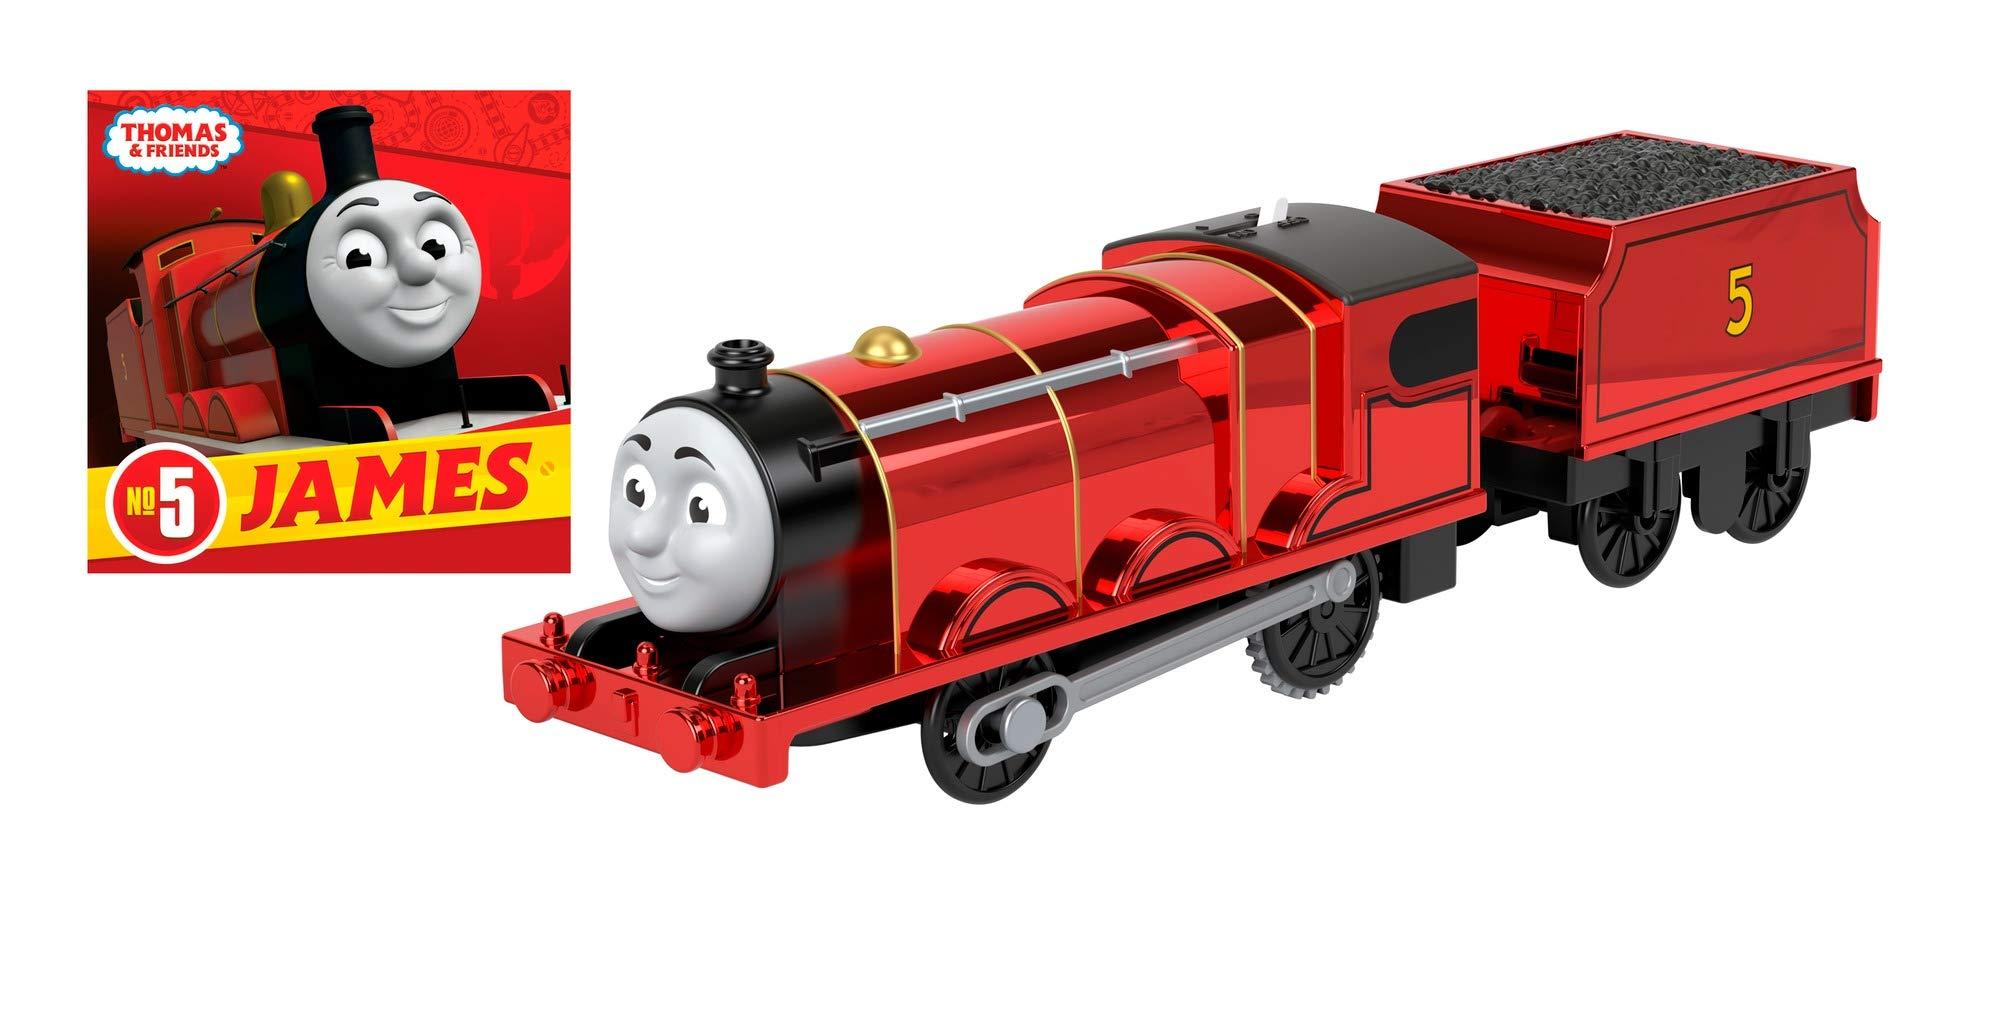 Thomas & Friends Celebration James Metallic Engine & Storybook, Multicolor, GNB49